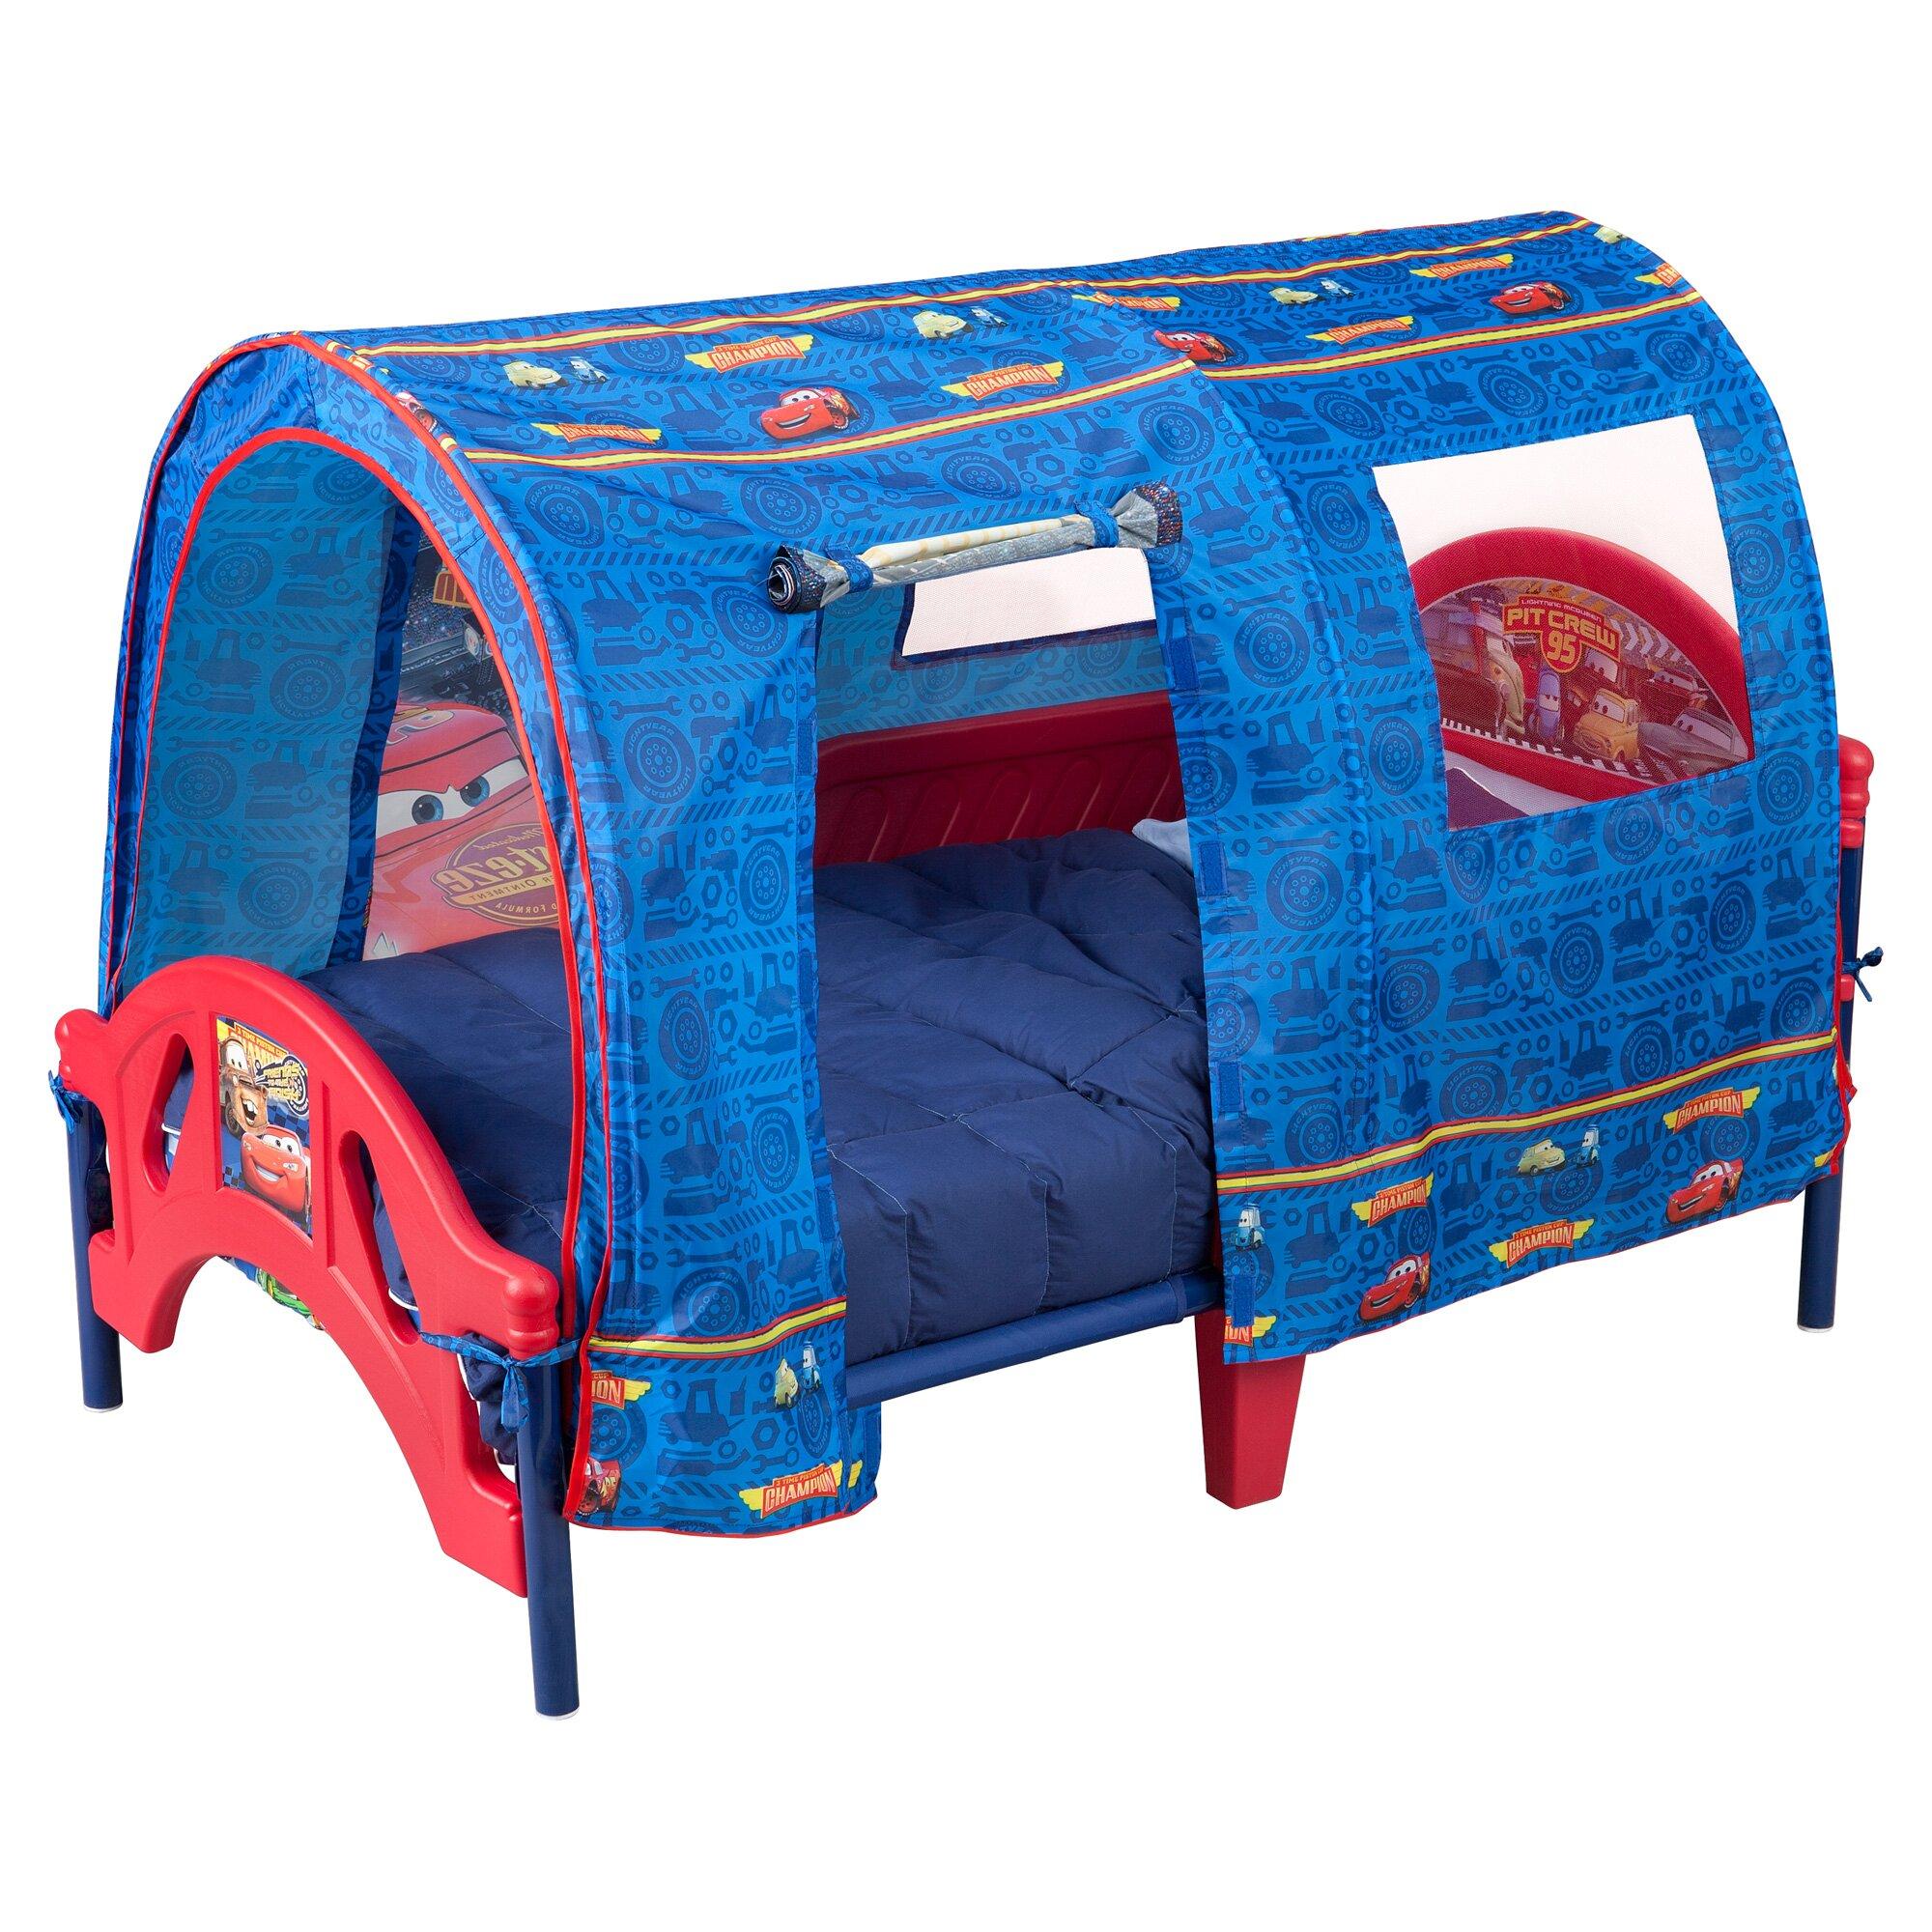 Toddler Canopy Bed : ... Children Disney Pixar Cars Tent Toddler Canopy Bed & Reviews  Wayfair